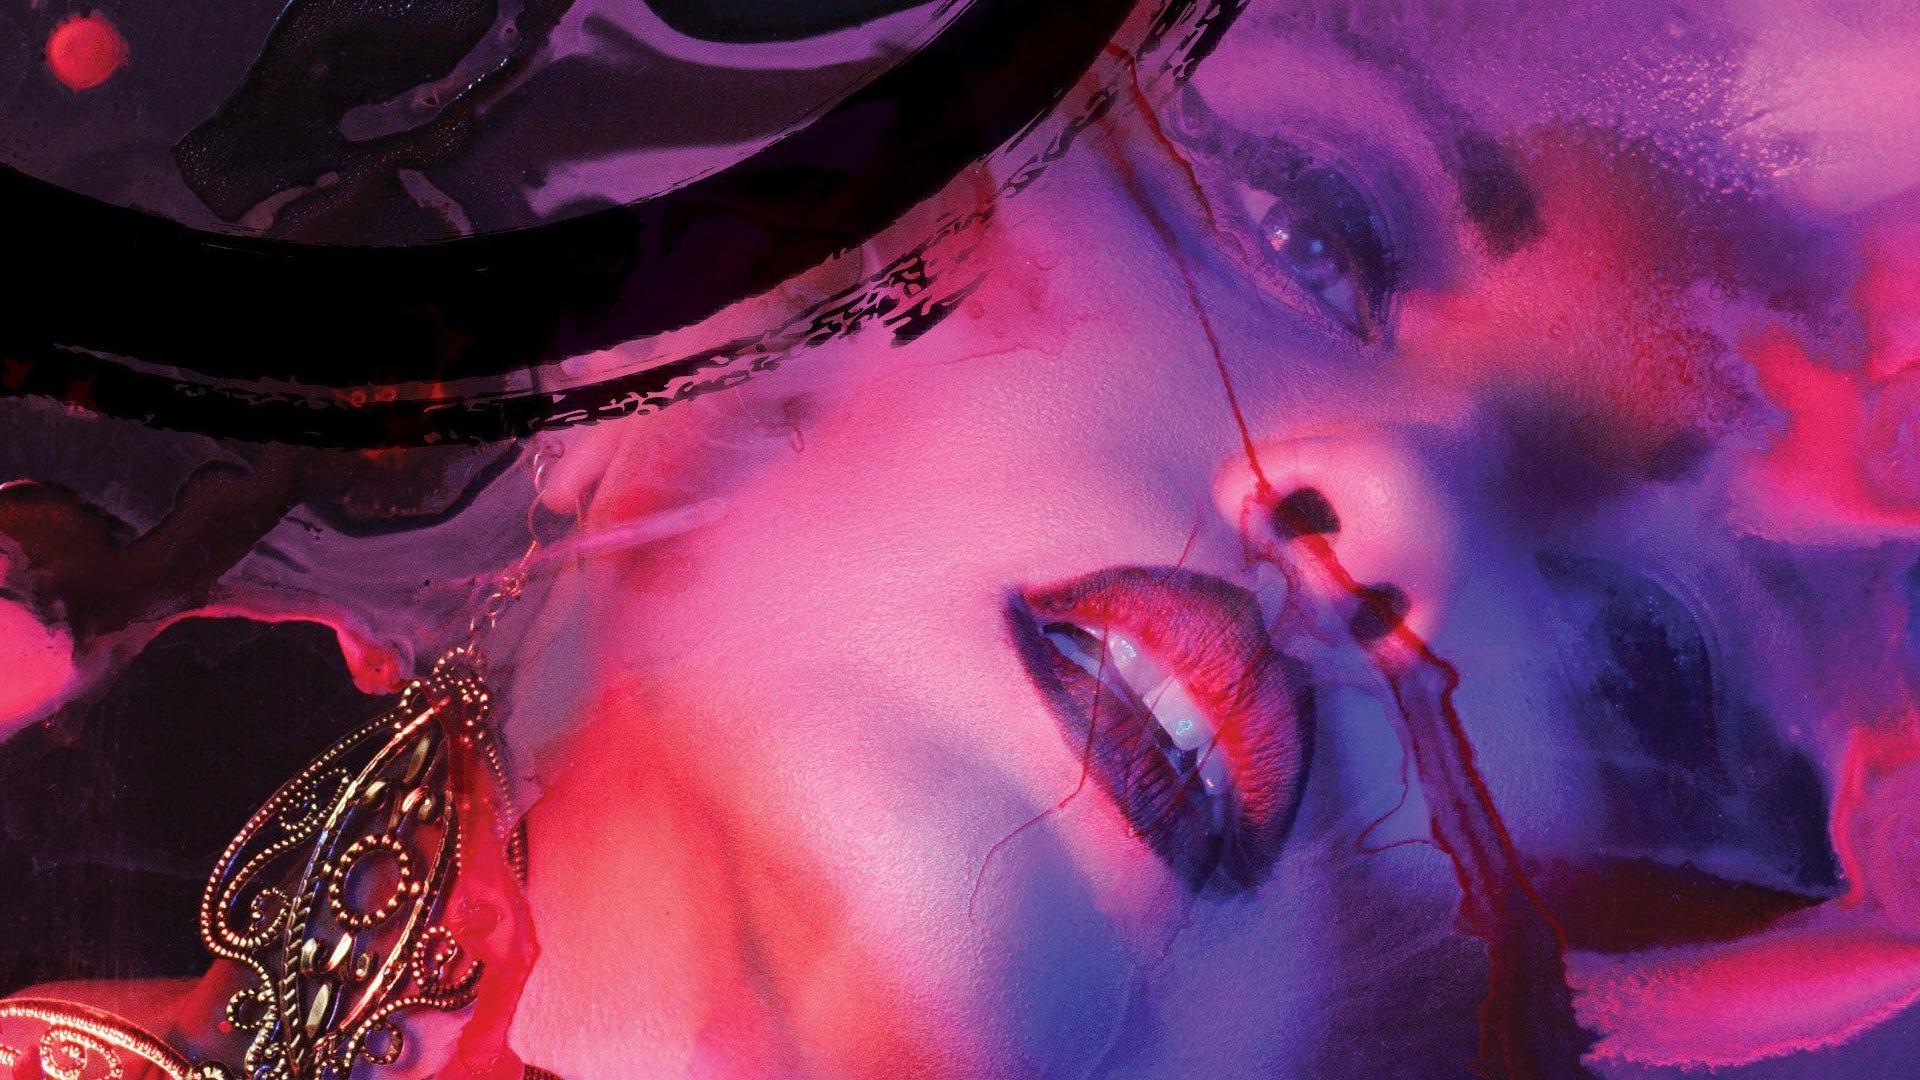 Vampire The Masquerade RPG Fifth Edition core rulebook artwork